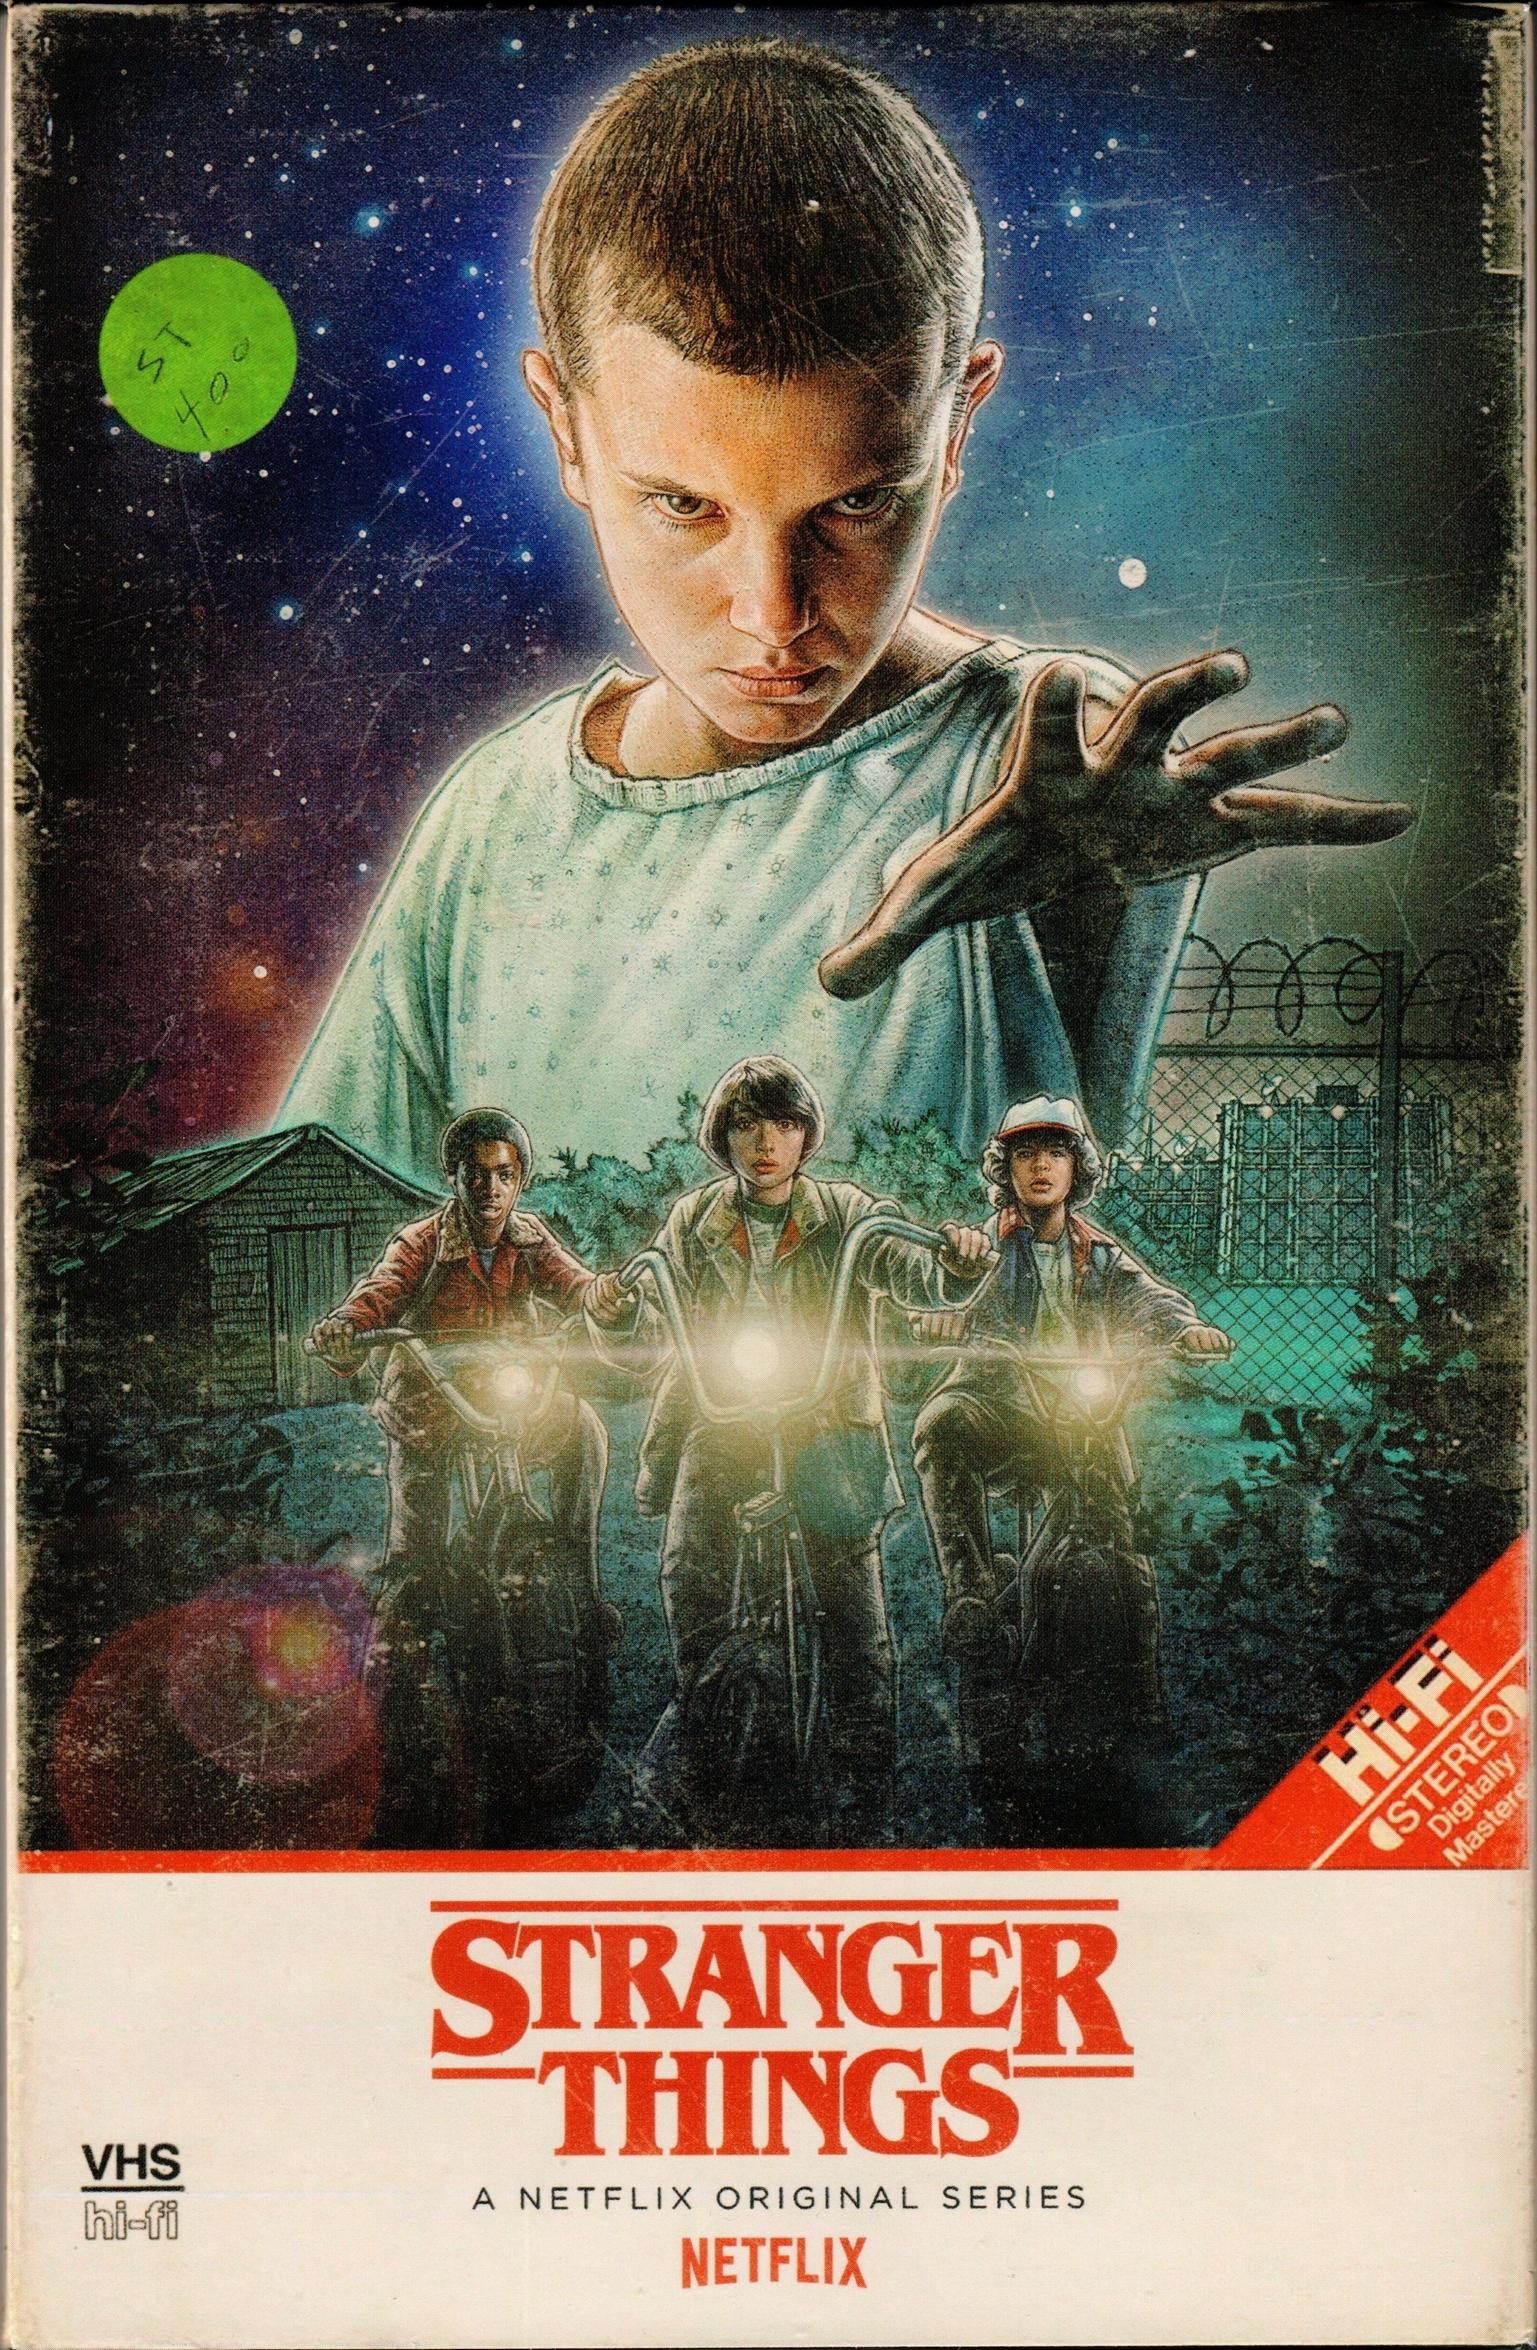 Stranger Things: Season 1 4K (Collectors Edition)(2016) Ultra HD Blu-ray